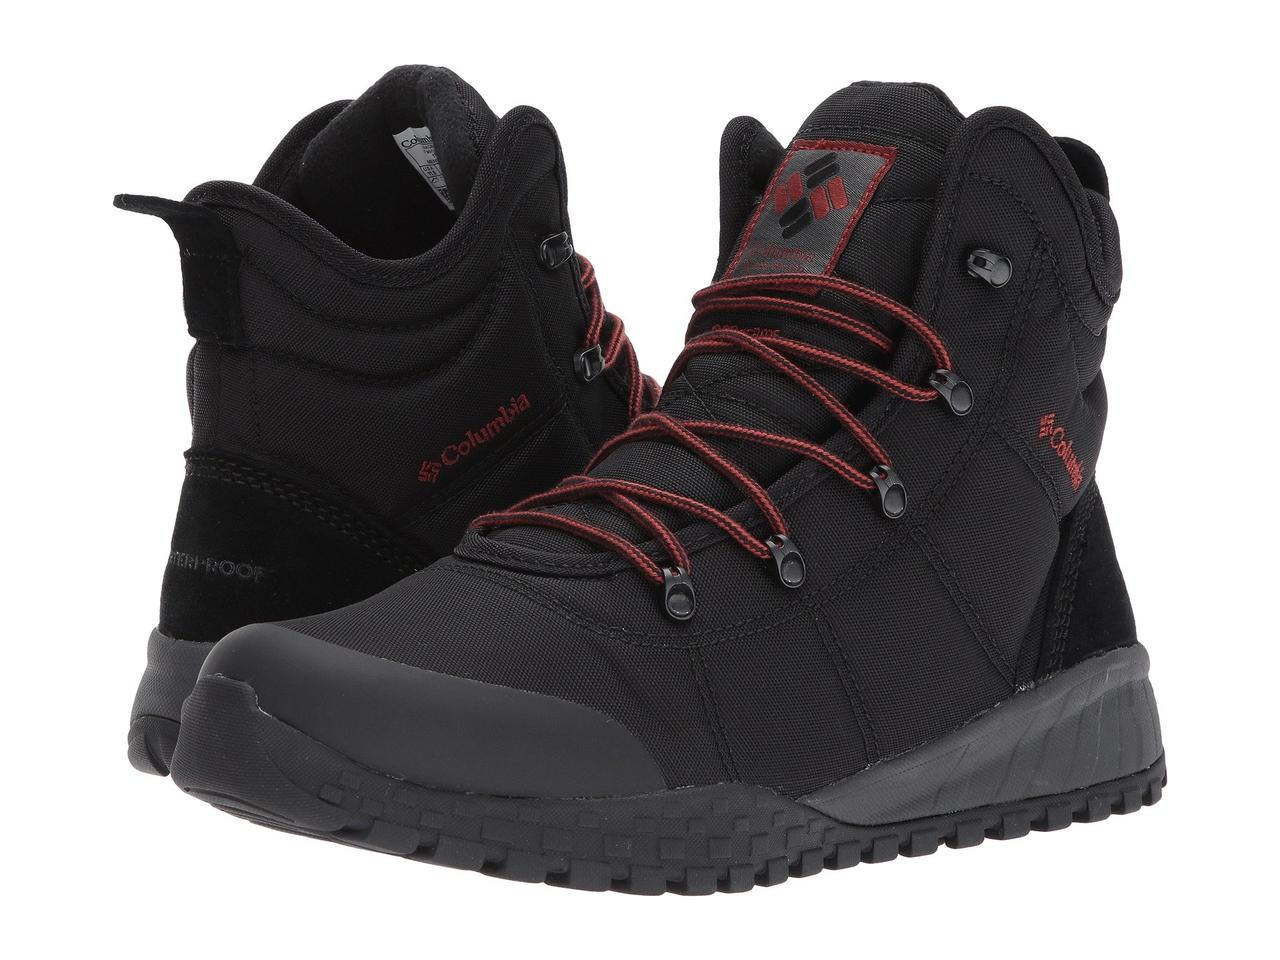 Ботинки Сапоги (Оригинал) Columbia Fairbanks Omni-Heat Black Rusty - TopUSA 9b9bd5b960a